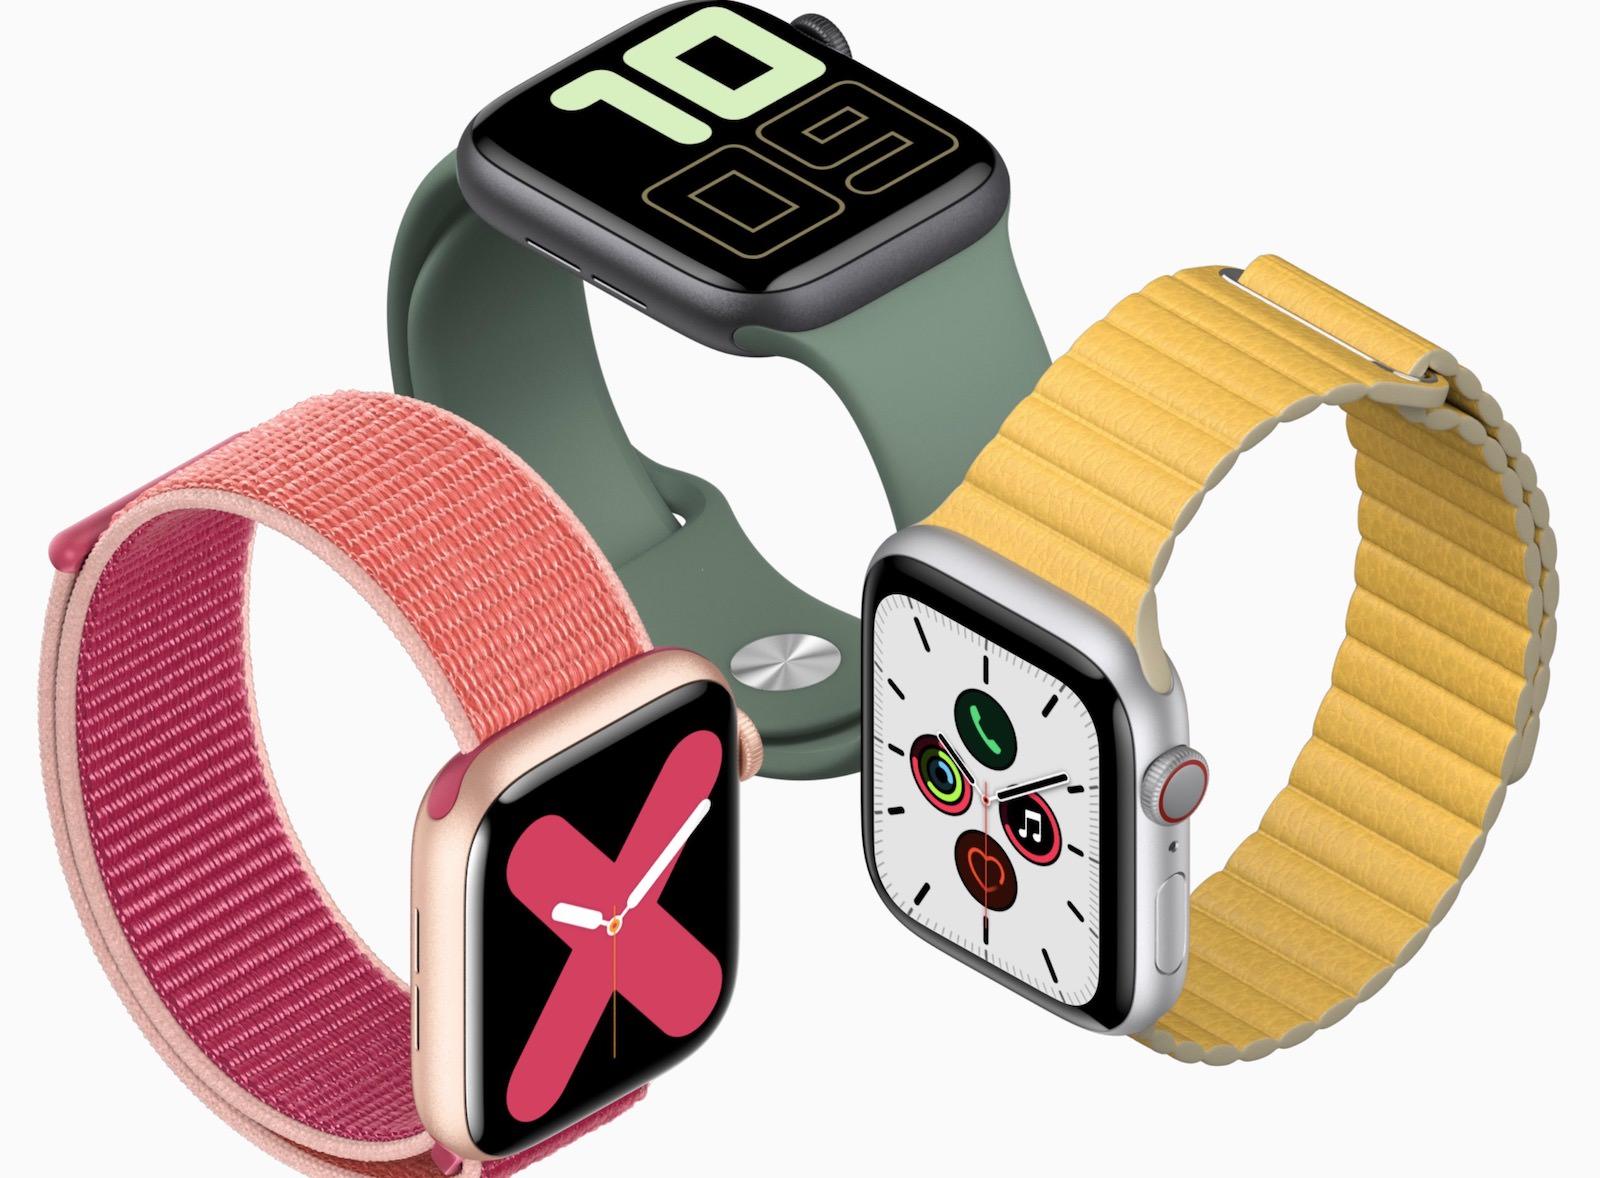 Apple Watch Series 5 top